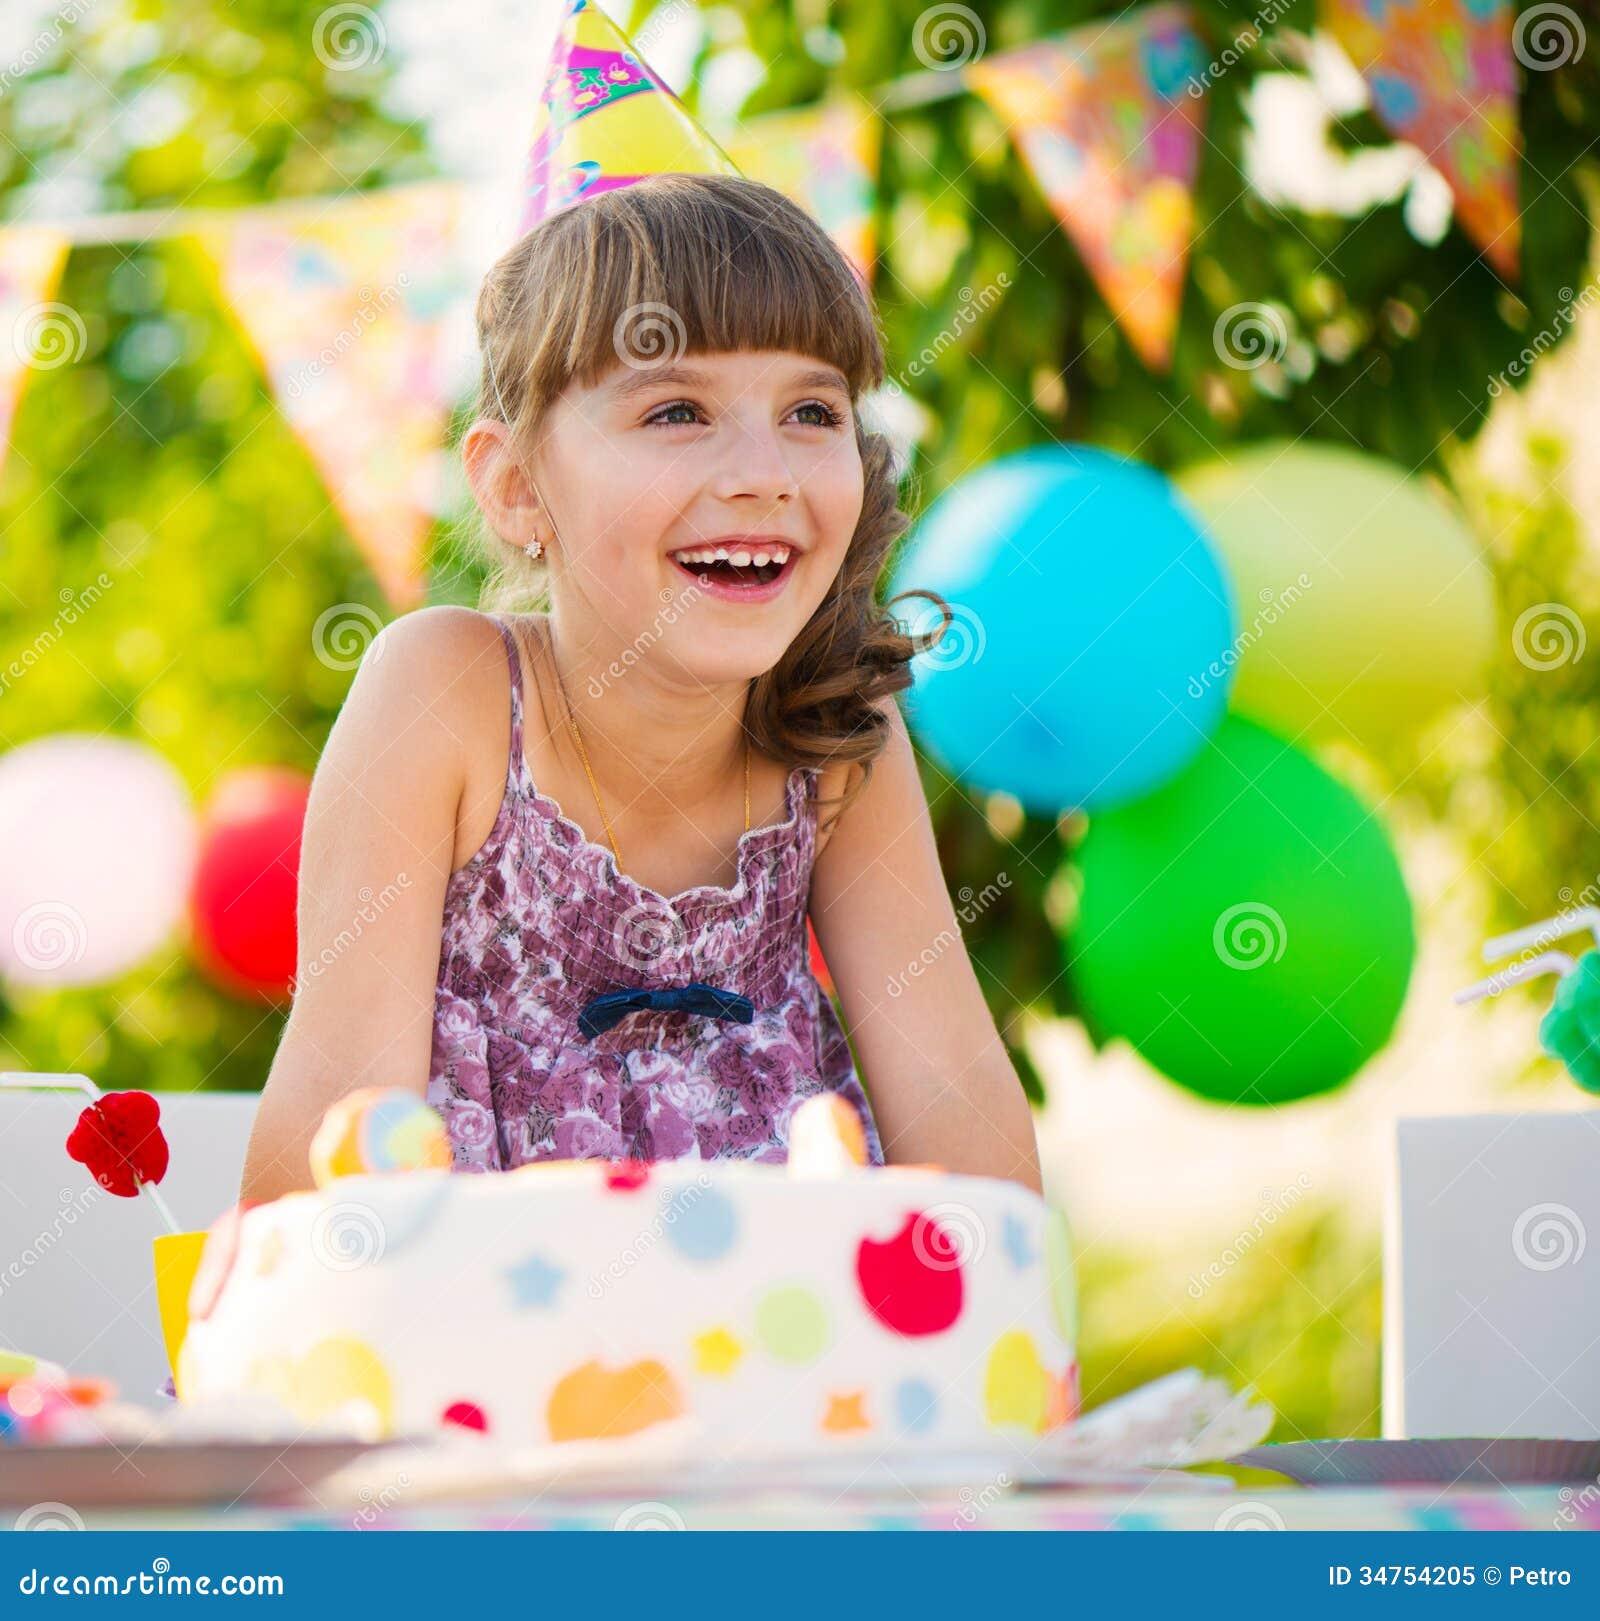 Children Birthday Party Stock Image Image Of Celebrating